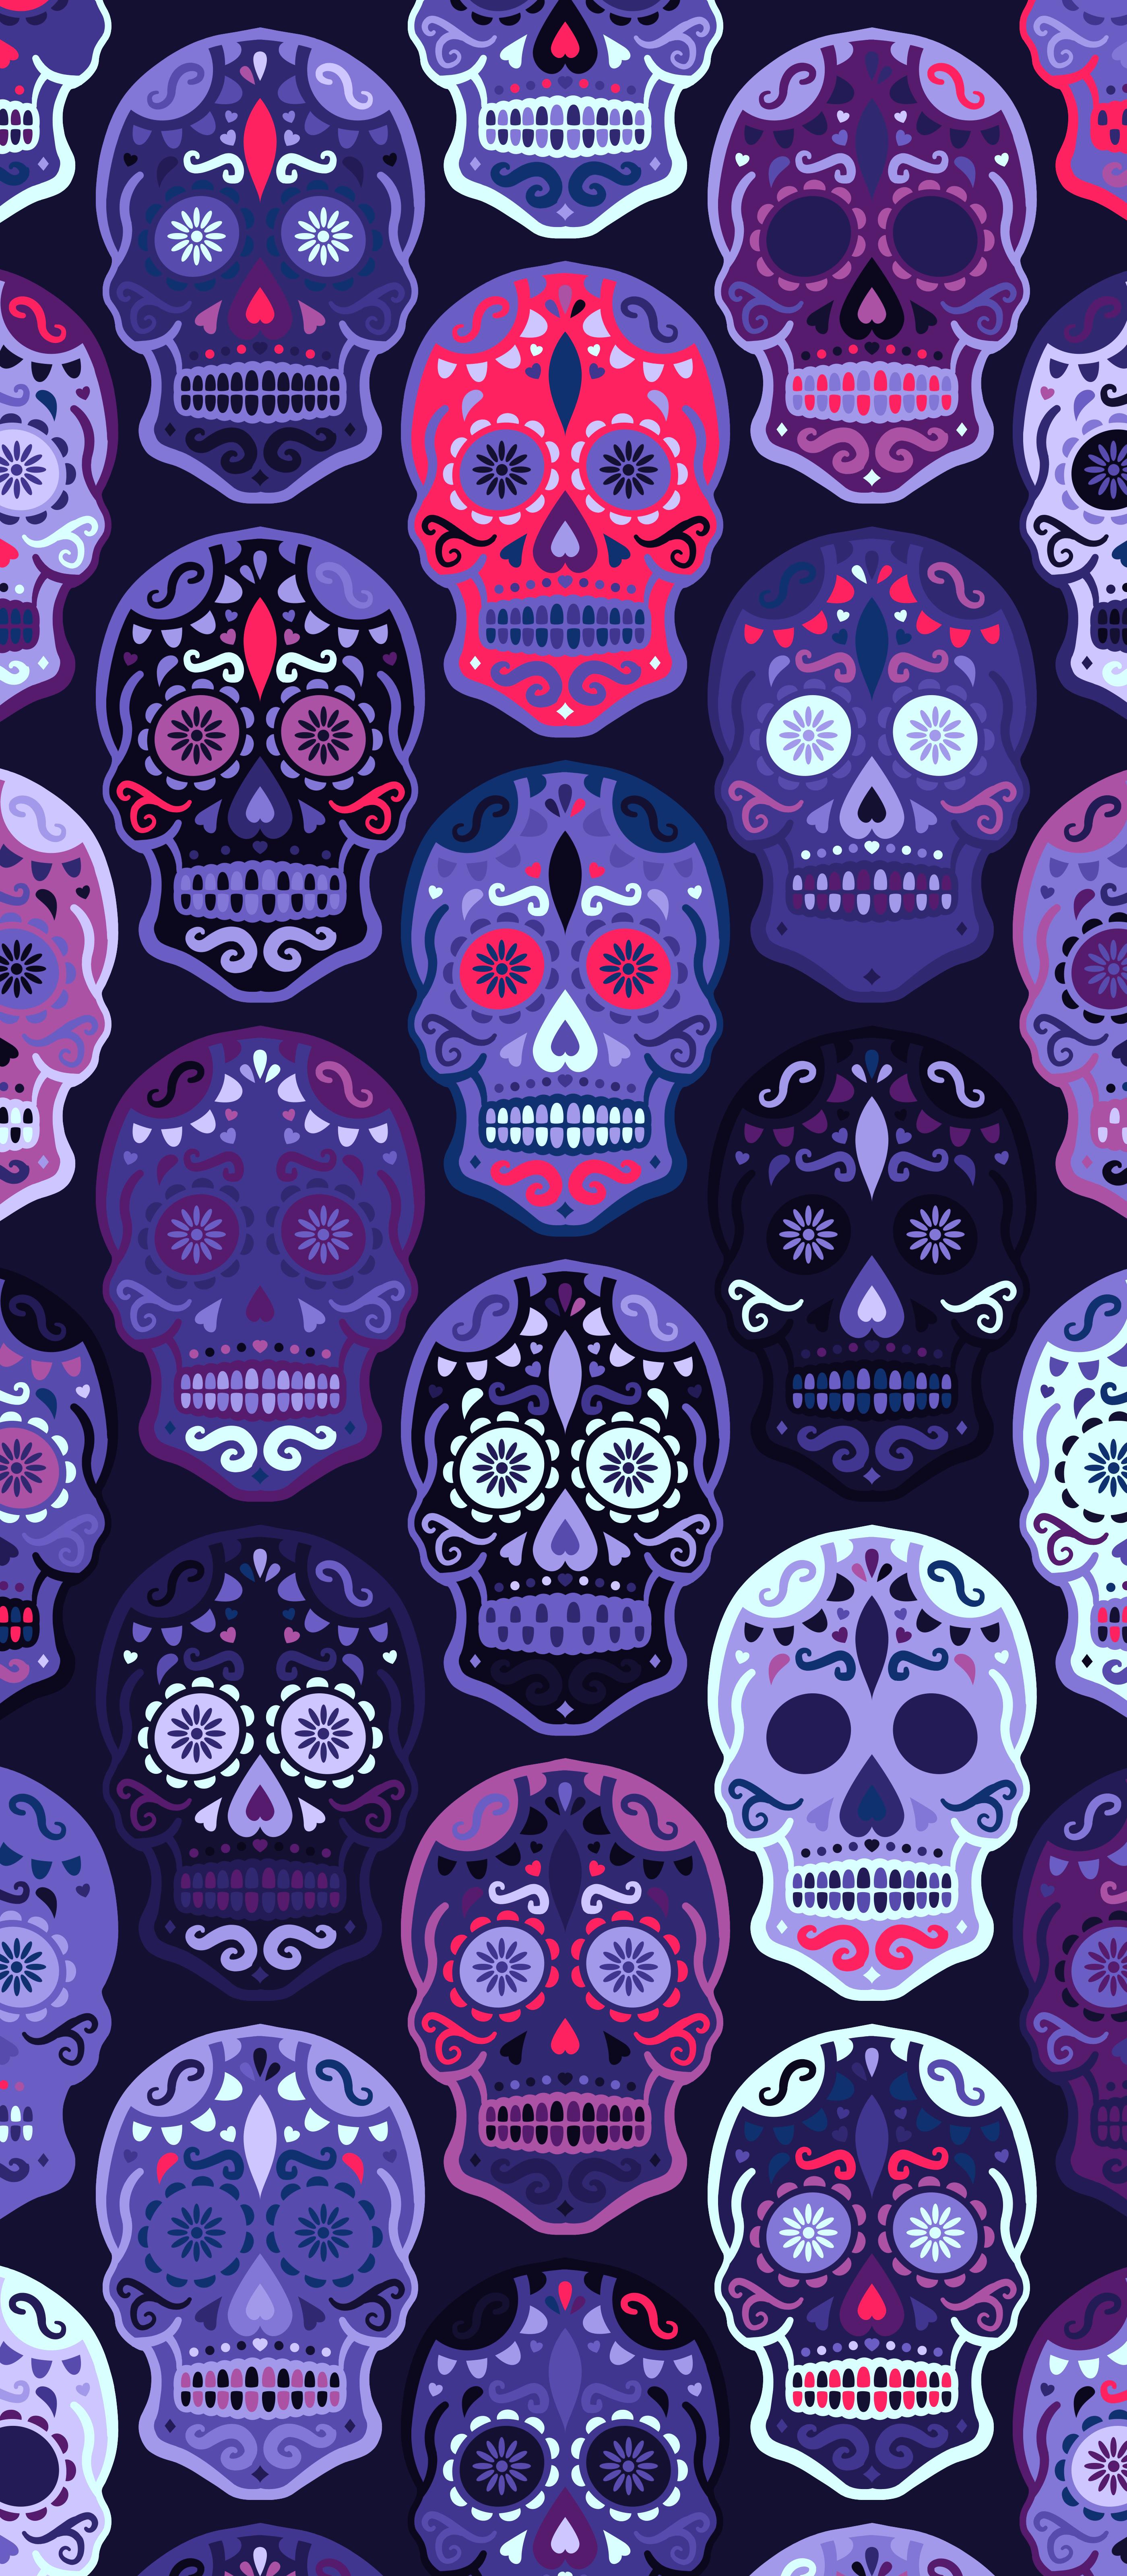 Sugar Skulls Wallpapers Top Free Sugar Skulls Backgrounds